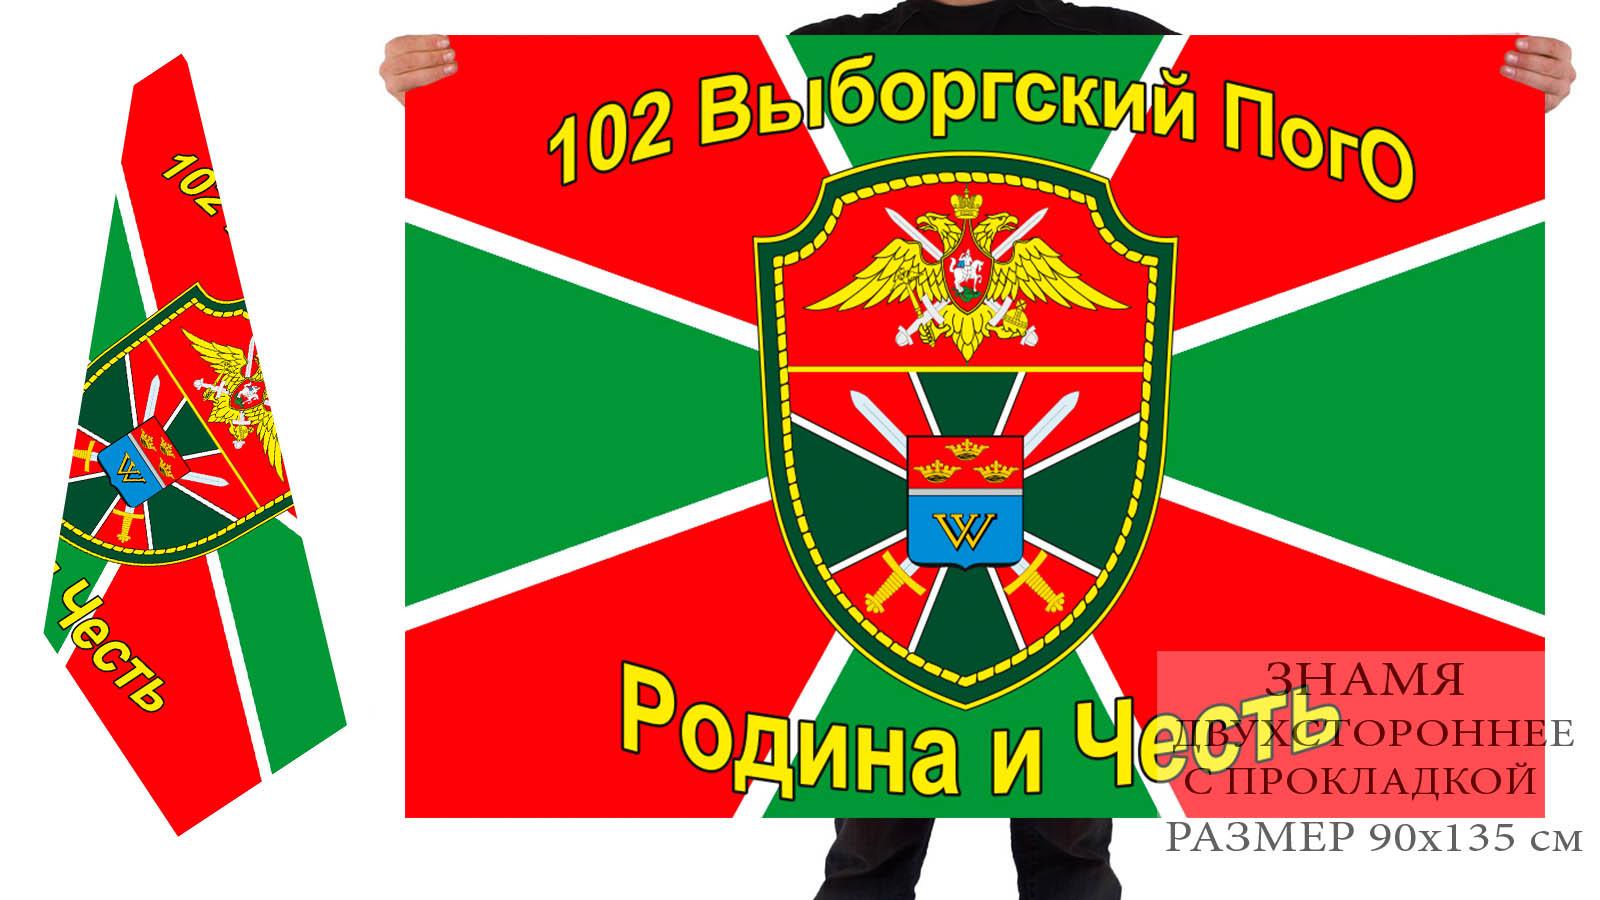 Двусторонний флаг 102 Краснознамённого Выборгского ПогО